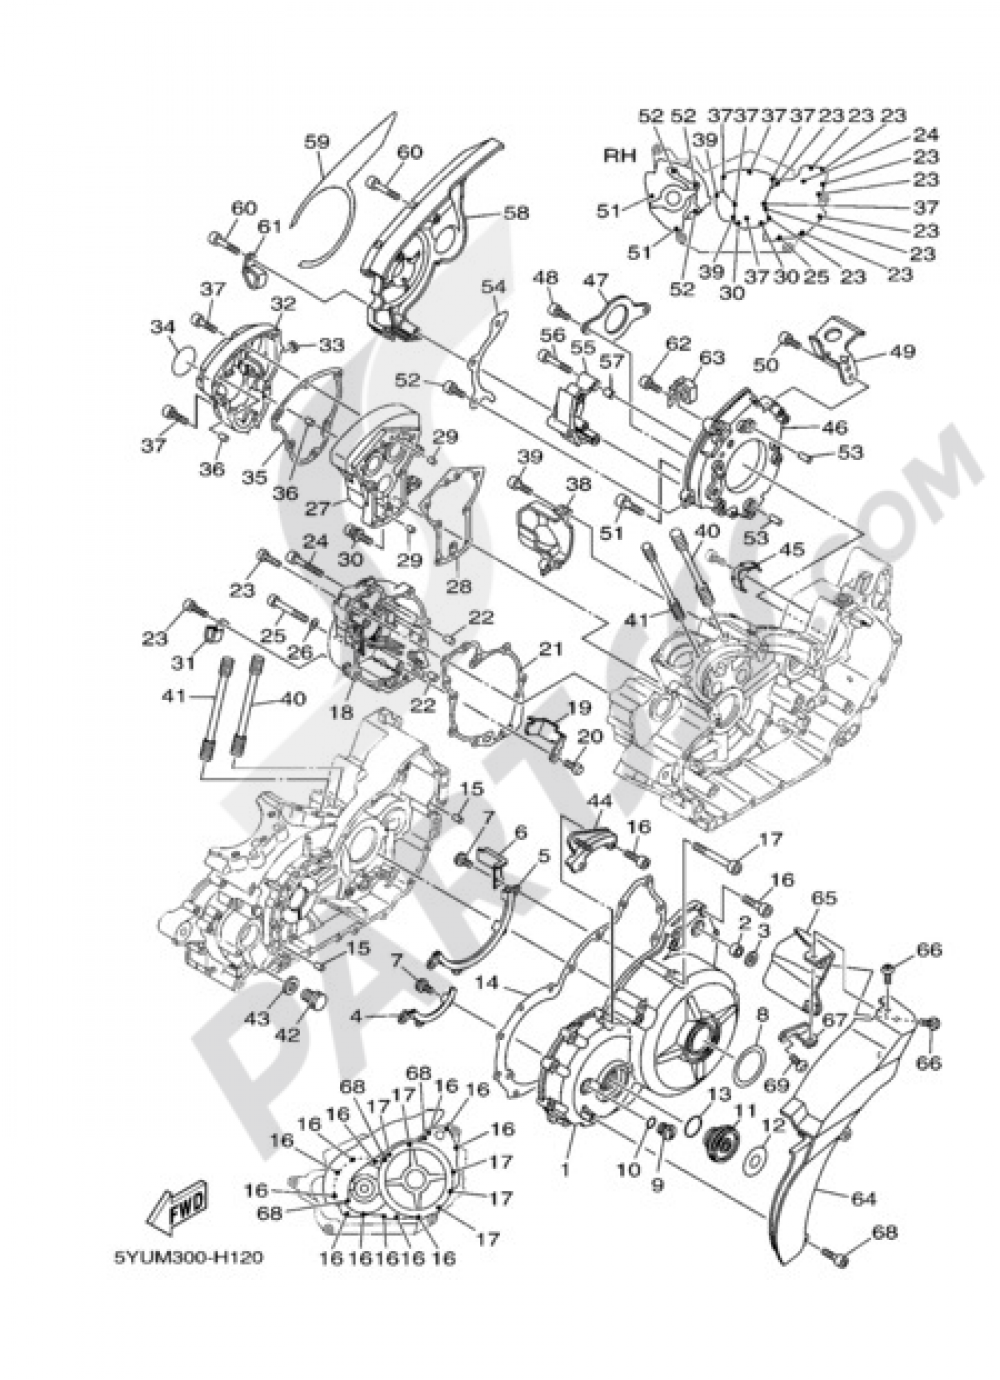 CRANKCASE COVER 1 Yamaha MT-01 2009